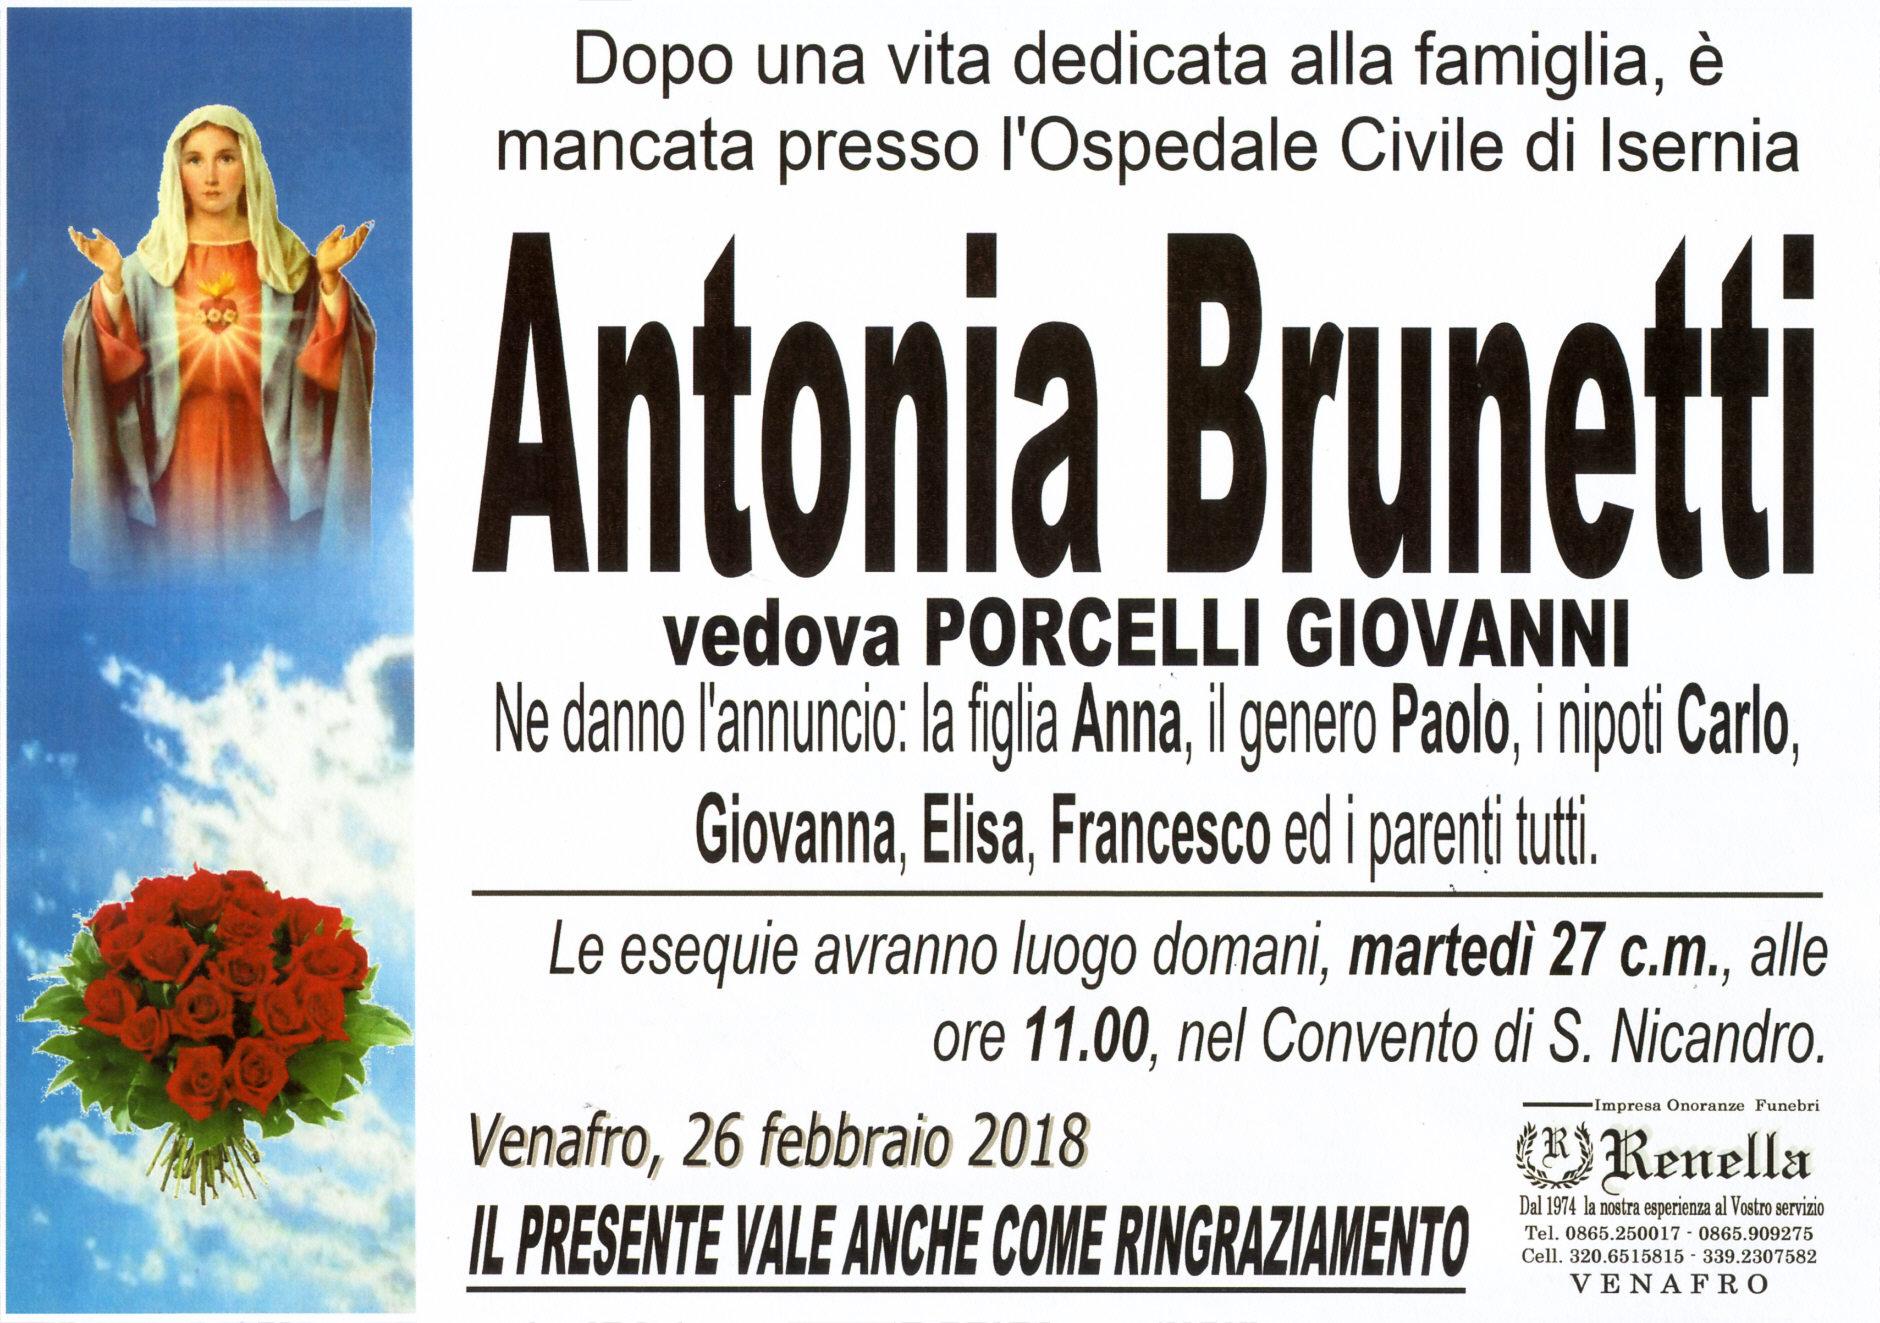 Antonia Brunetti – 26/02/2018 – Venafro – Impresa Onoranze Funebri Renella